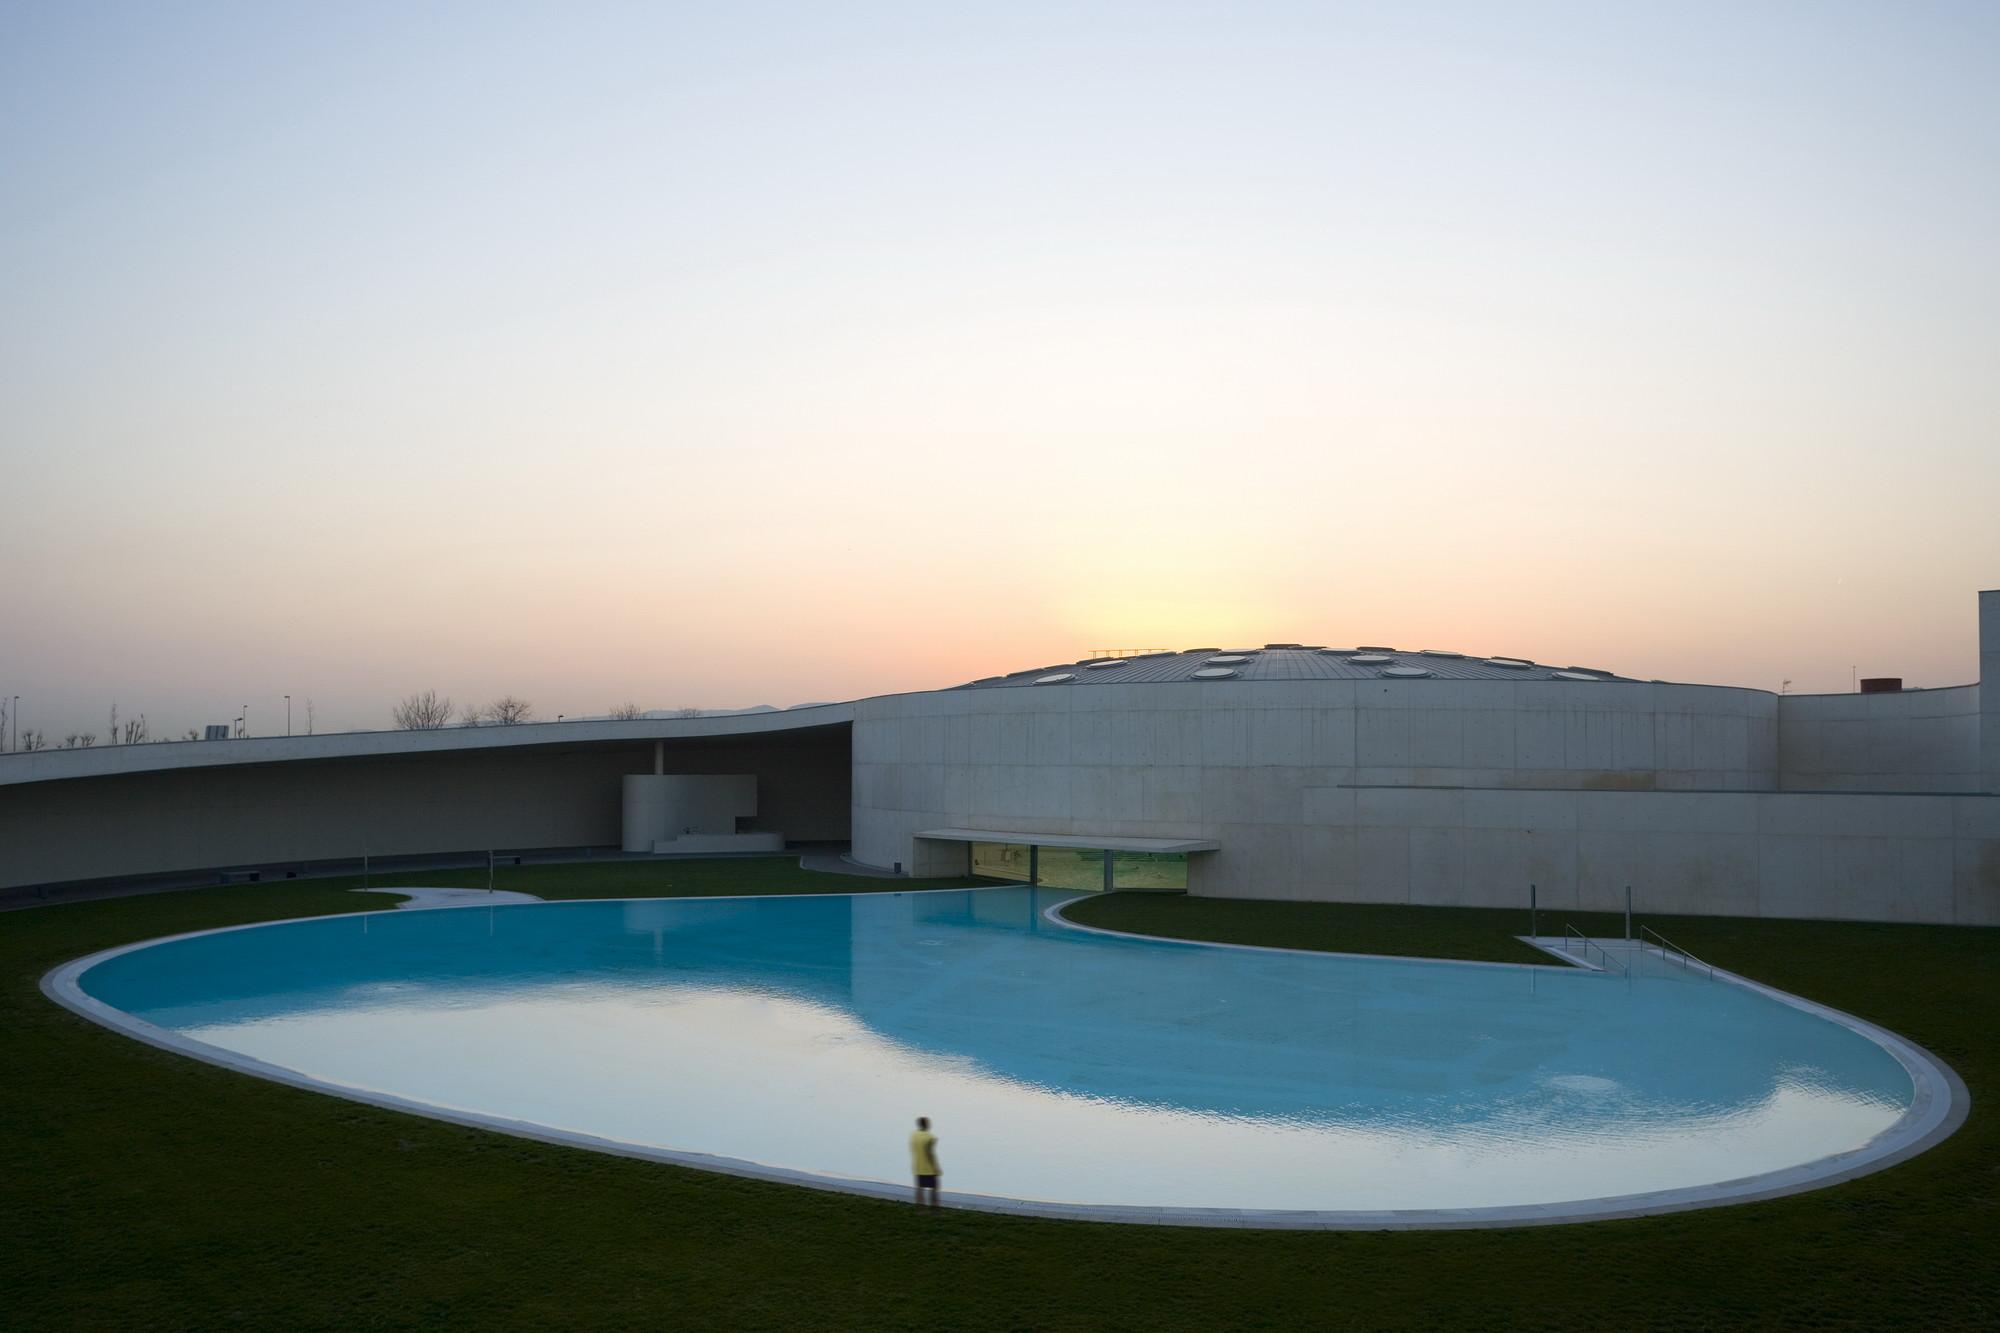 Ribero-Serralo Sports Complex - 2006. Image © Fernando Guerra | FG+SG